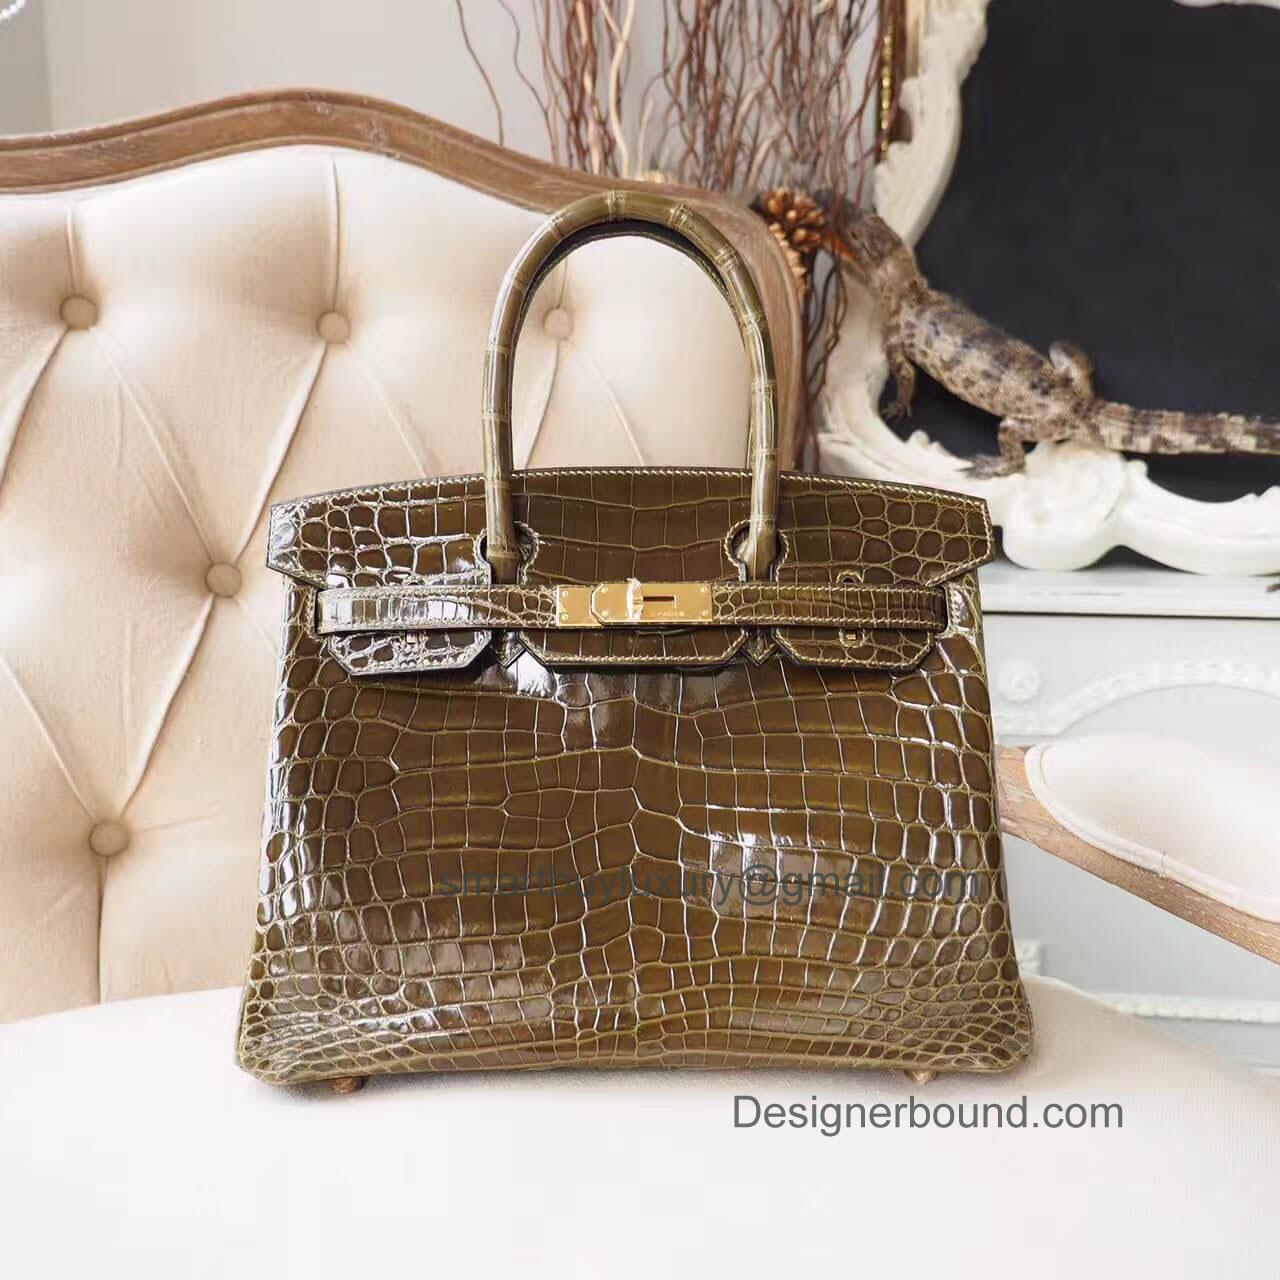 07b46f6165 Hermes Birkin 30 Bag in 6h Veronses Shiny Nile Croc GHW